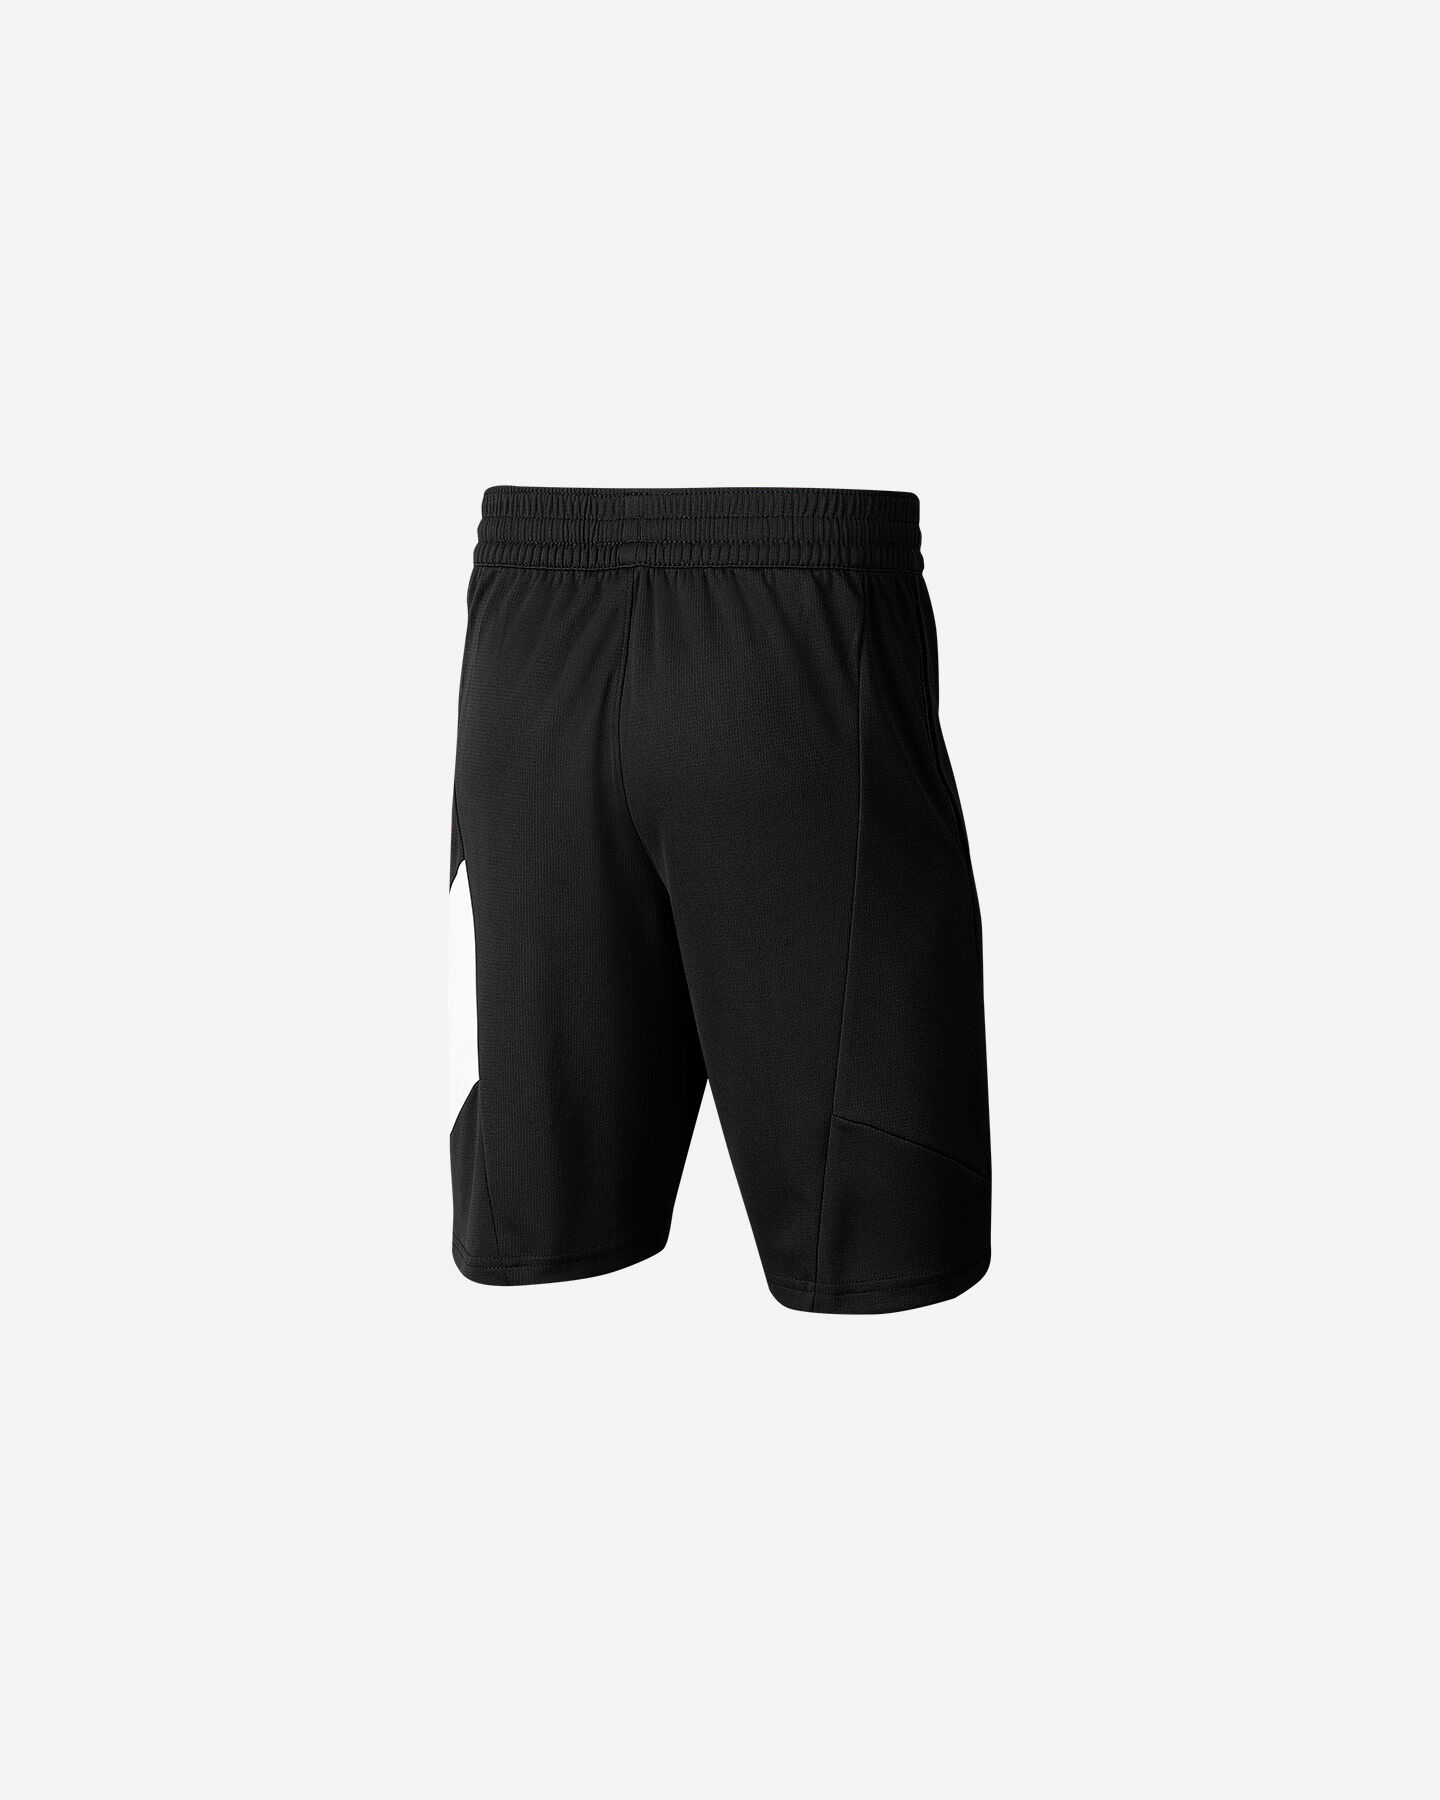 Pantaloncini NIKE ELITE JR S5164664 scatto 1